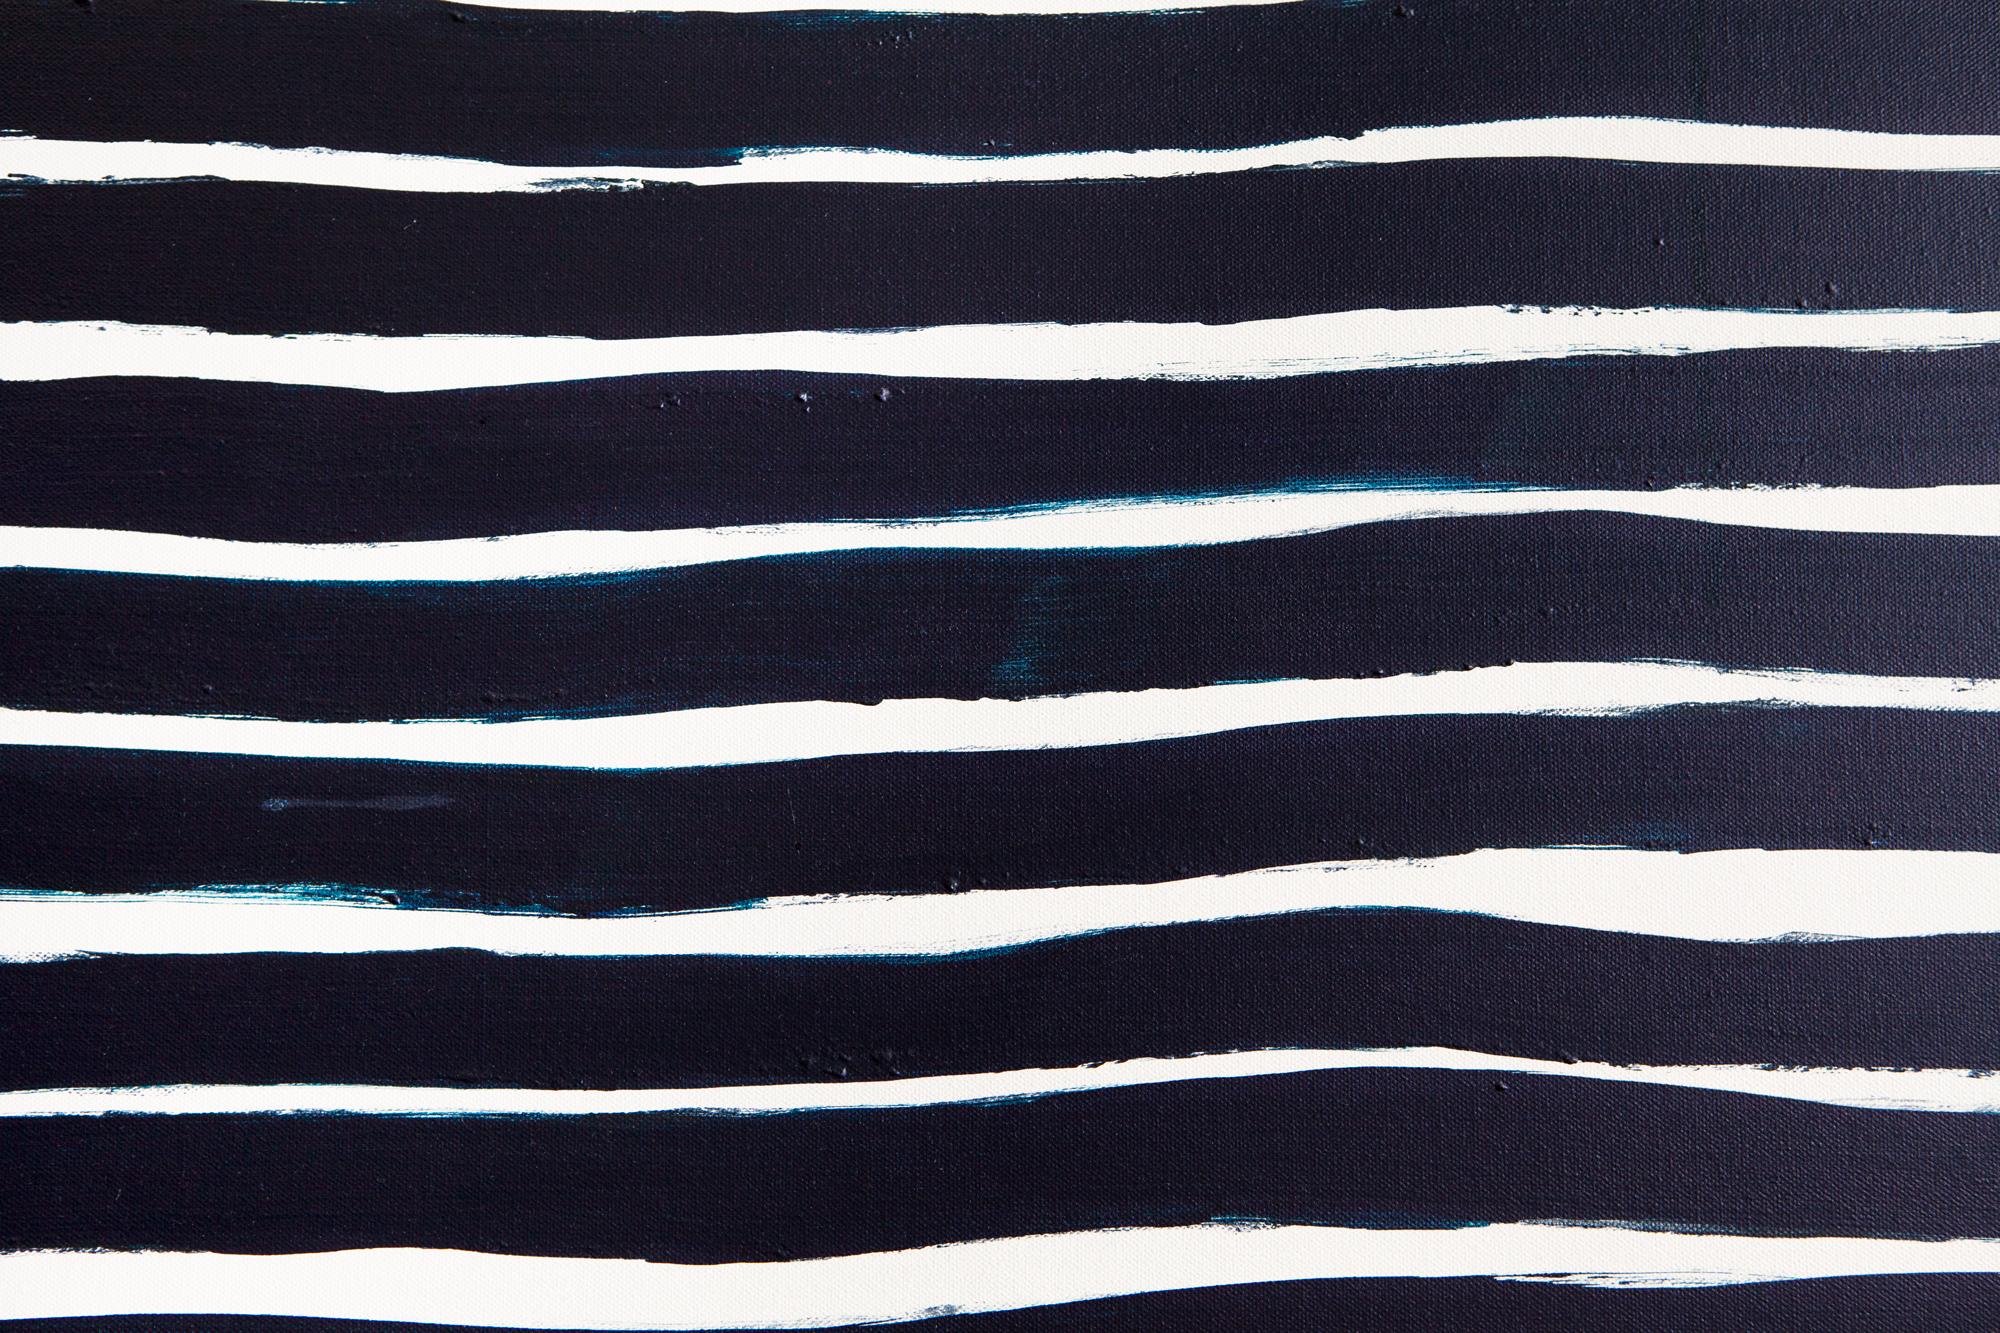 Liam-Murphy-Art-Port-Fairy-10-Black-Lines-Close.jpg